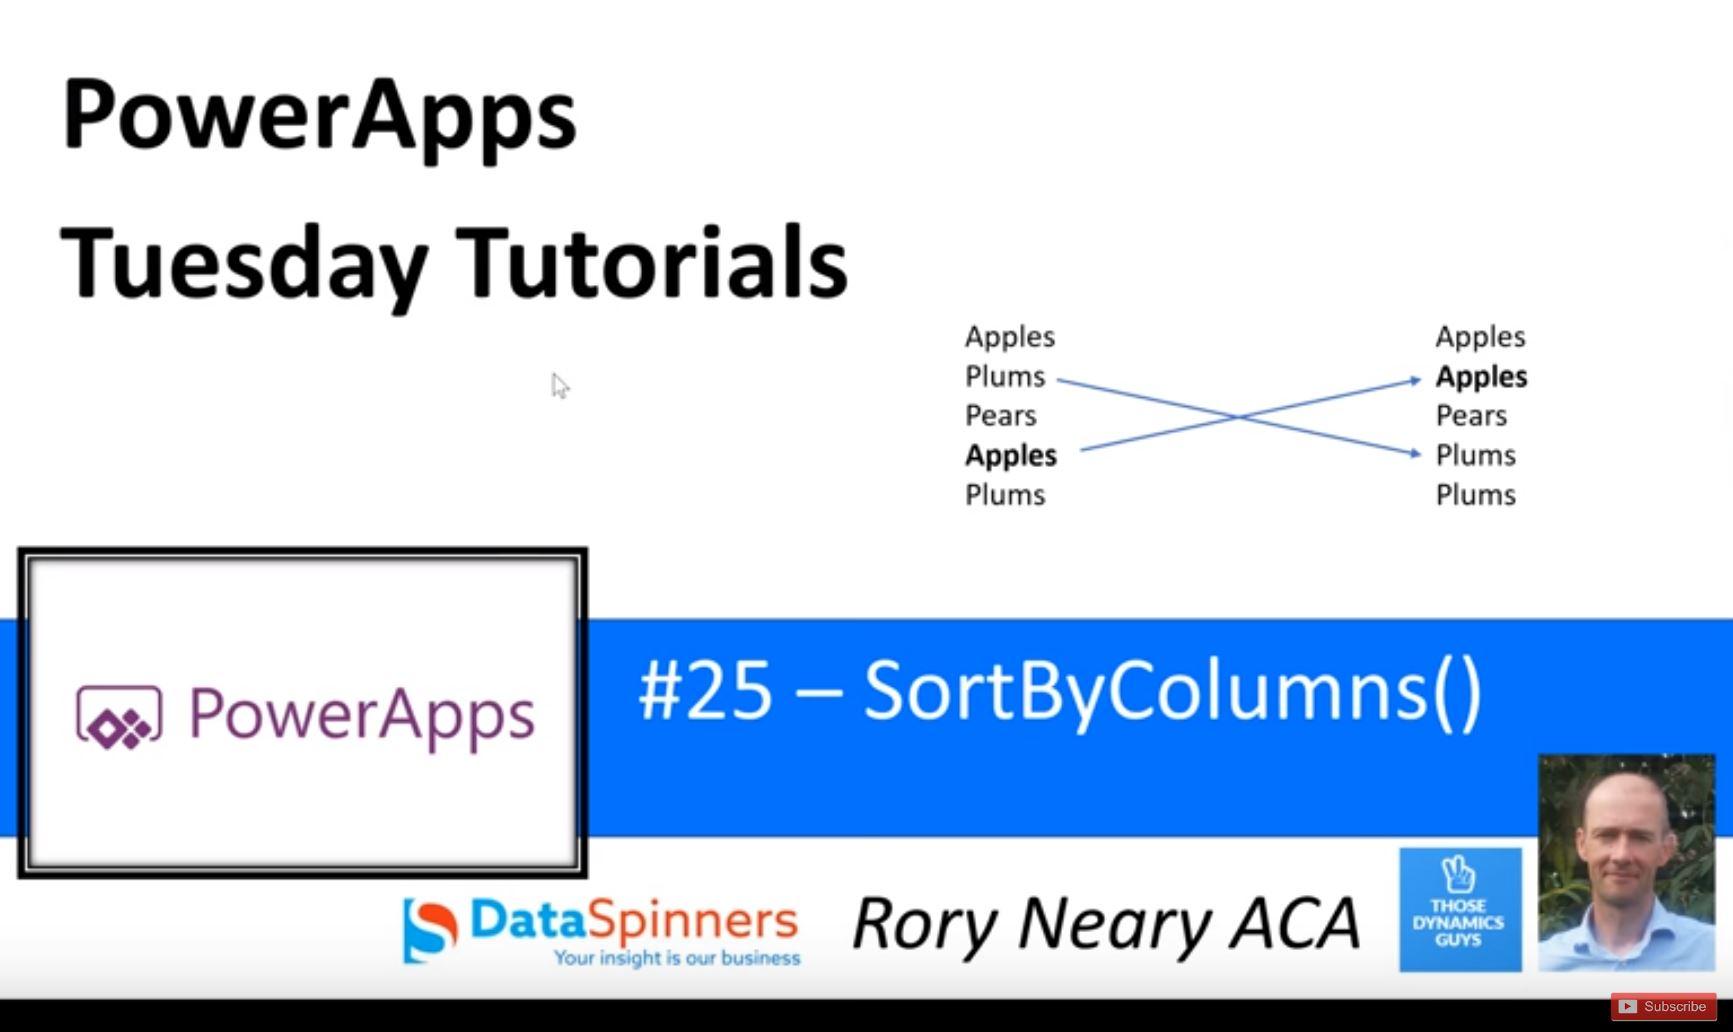 PowerApps Tuesday Tutorials #25 SortByColumns